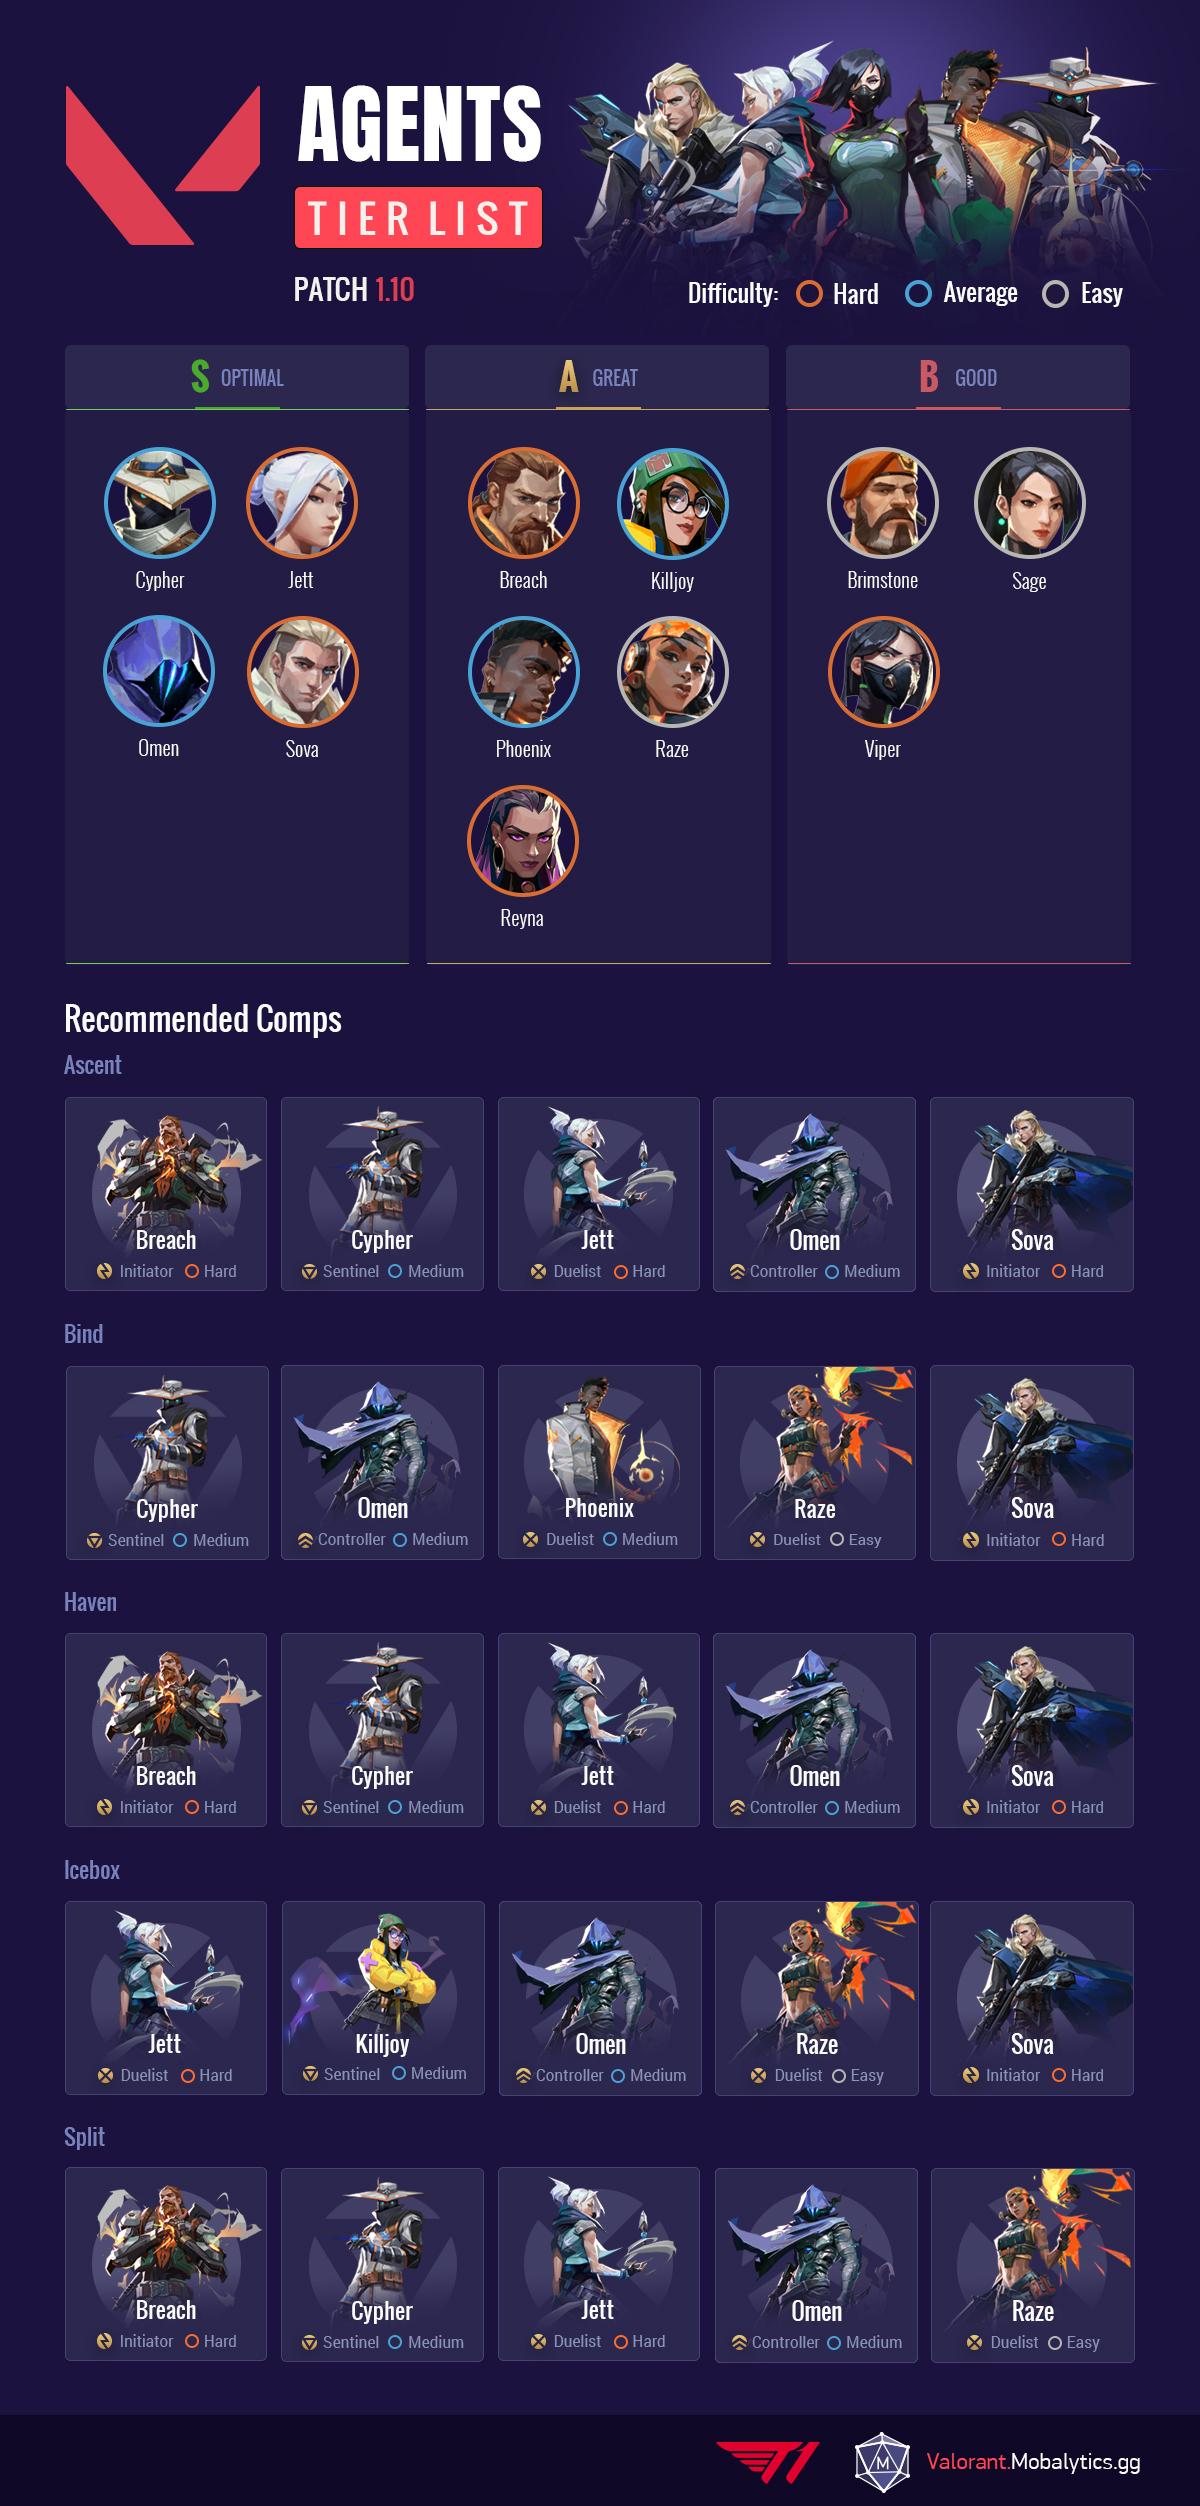 Valorant Agent Tier List 1.10